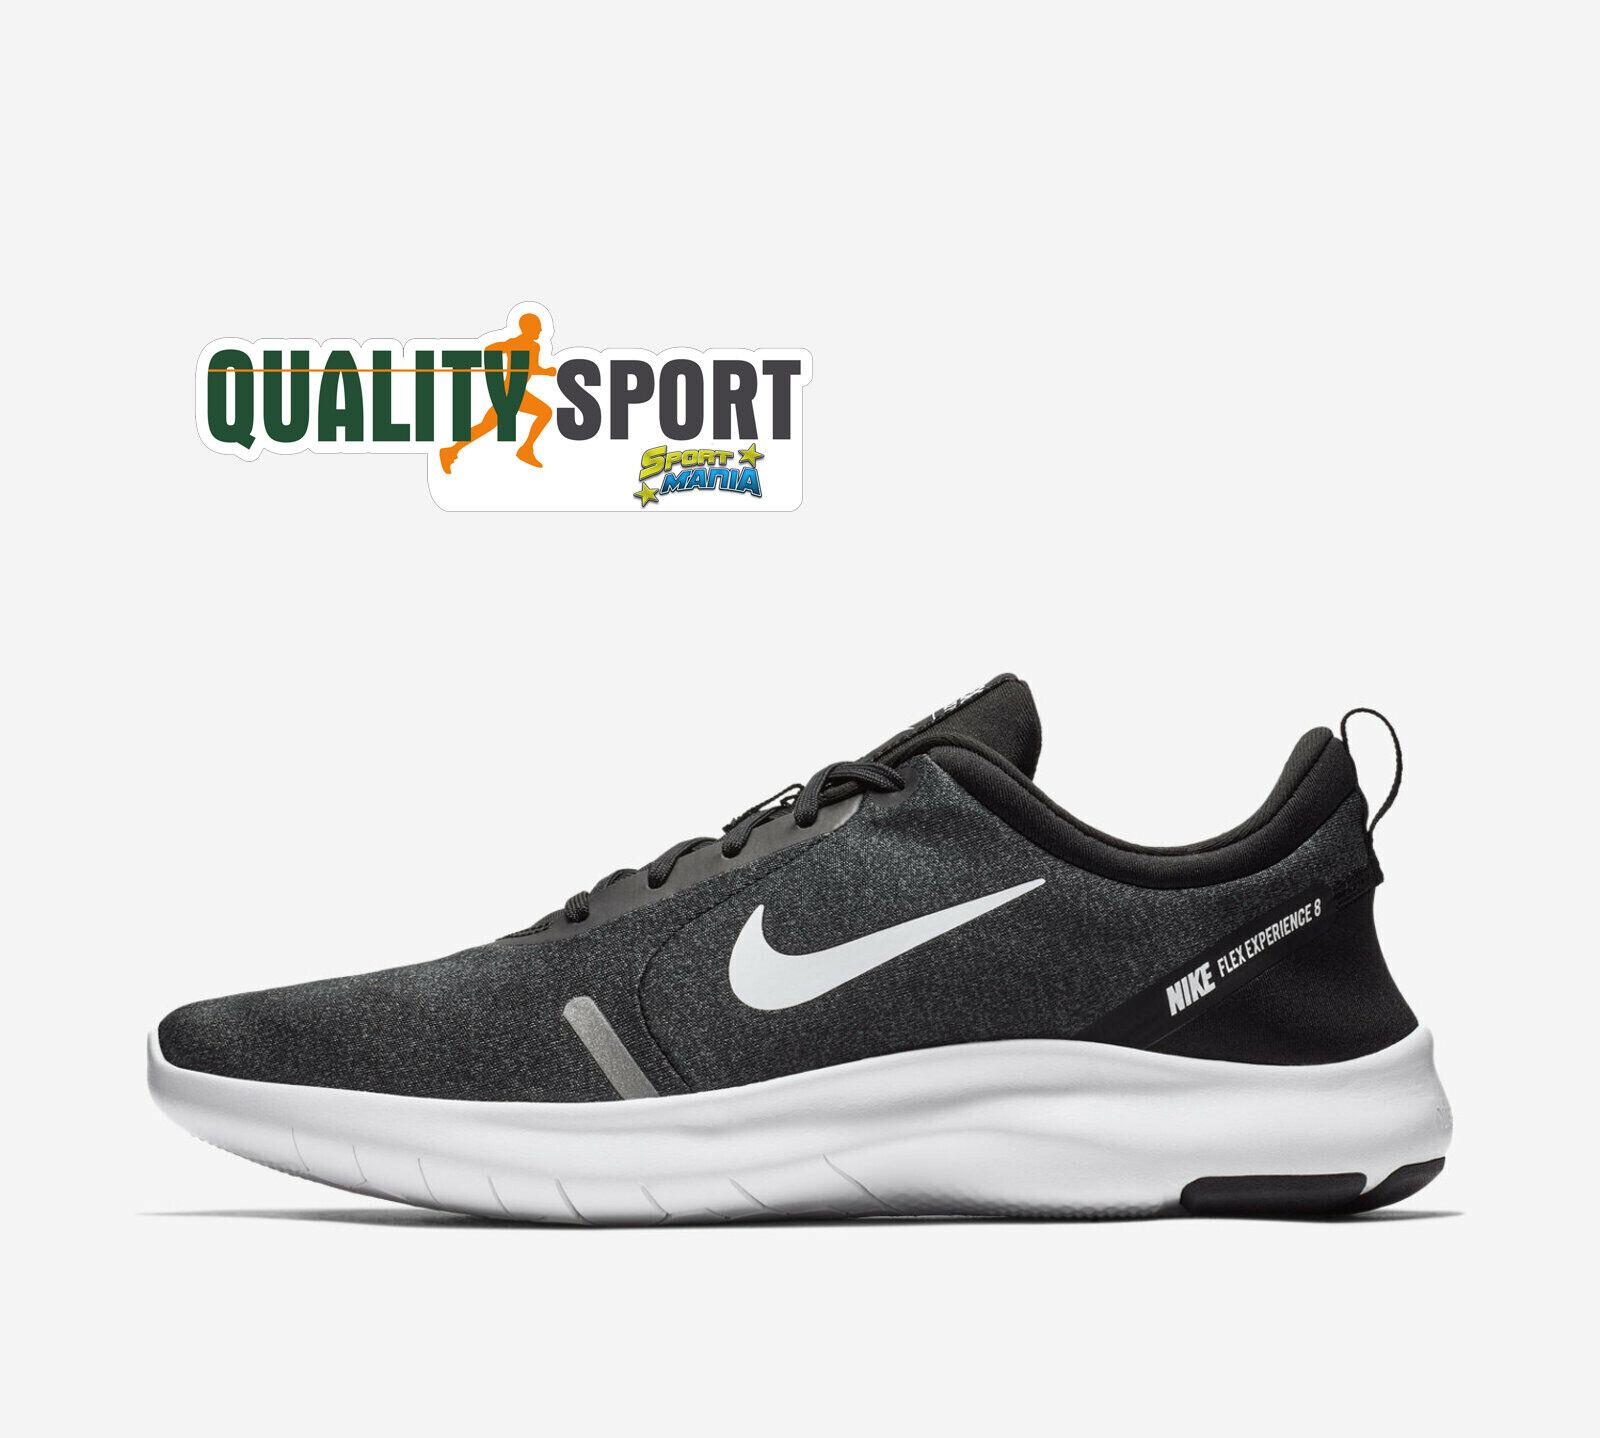 Nike Flex Experience black shoes men Sportive Running Palestra AJ5900 013 2019